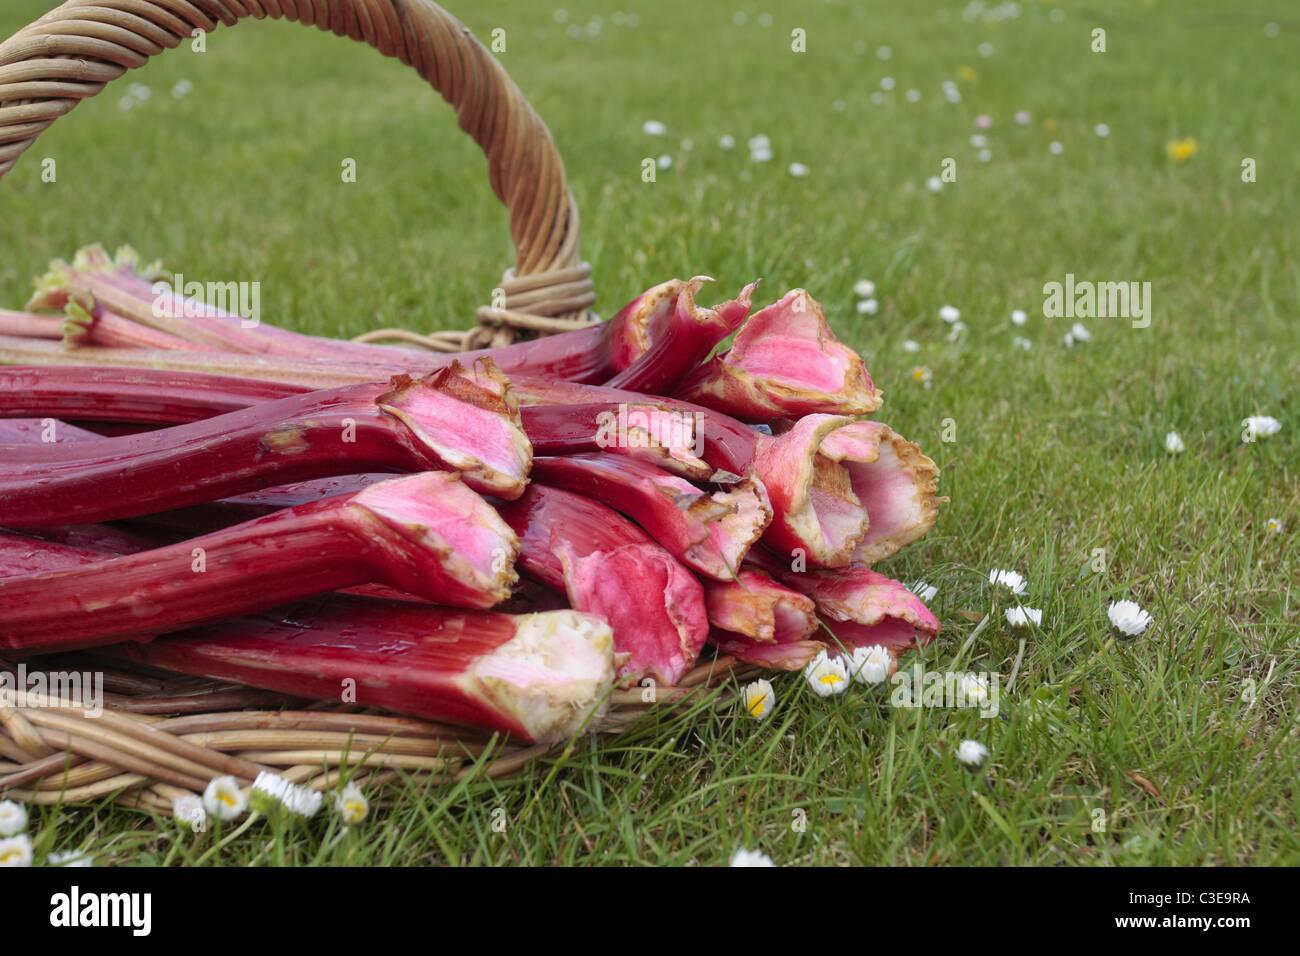 Freshly picked rhubarb on basket - Stock Image